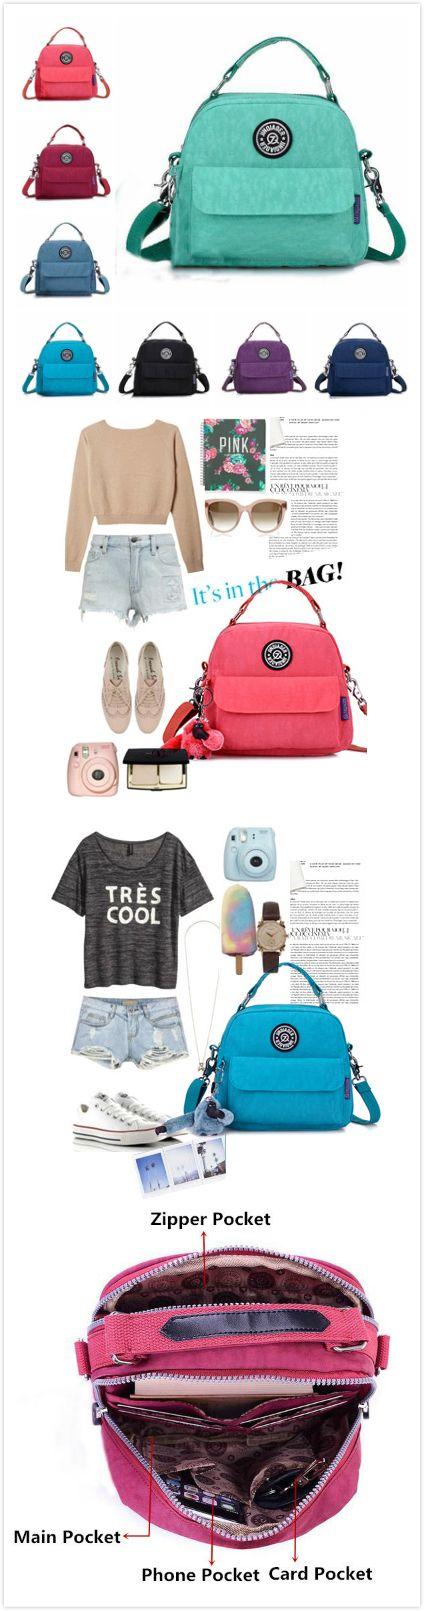 [$ 16.79] Jinqiaoer Women Waterproof Casual Portable Totes Crossbody Bags Shoulder Bags Backpack